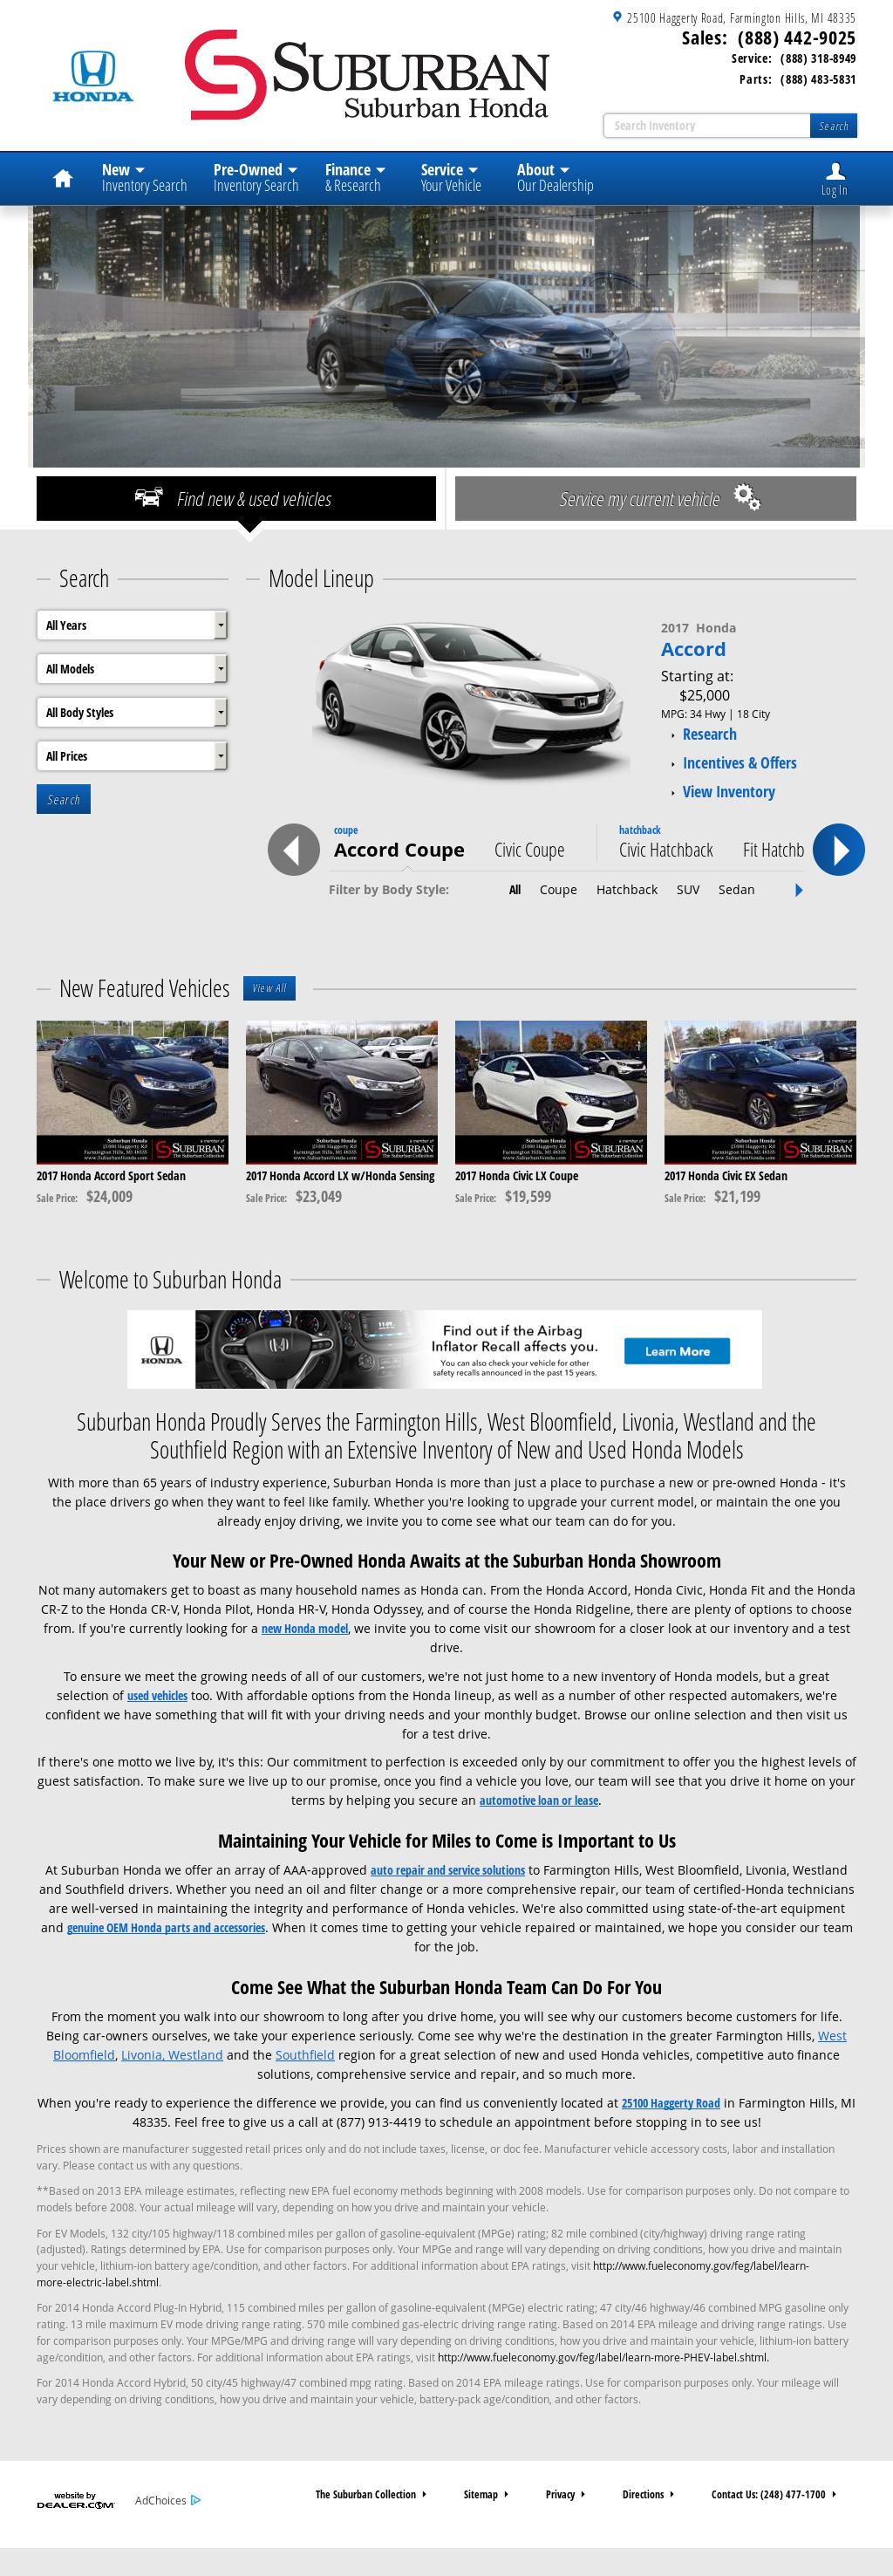 Suburban Honda Website History